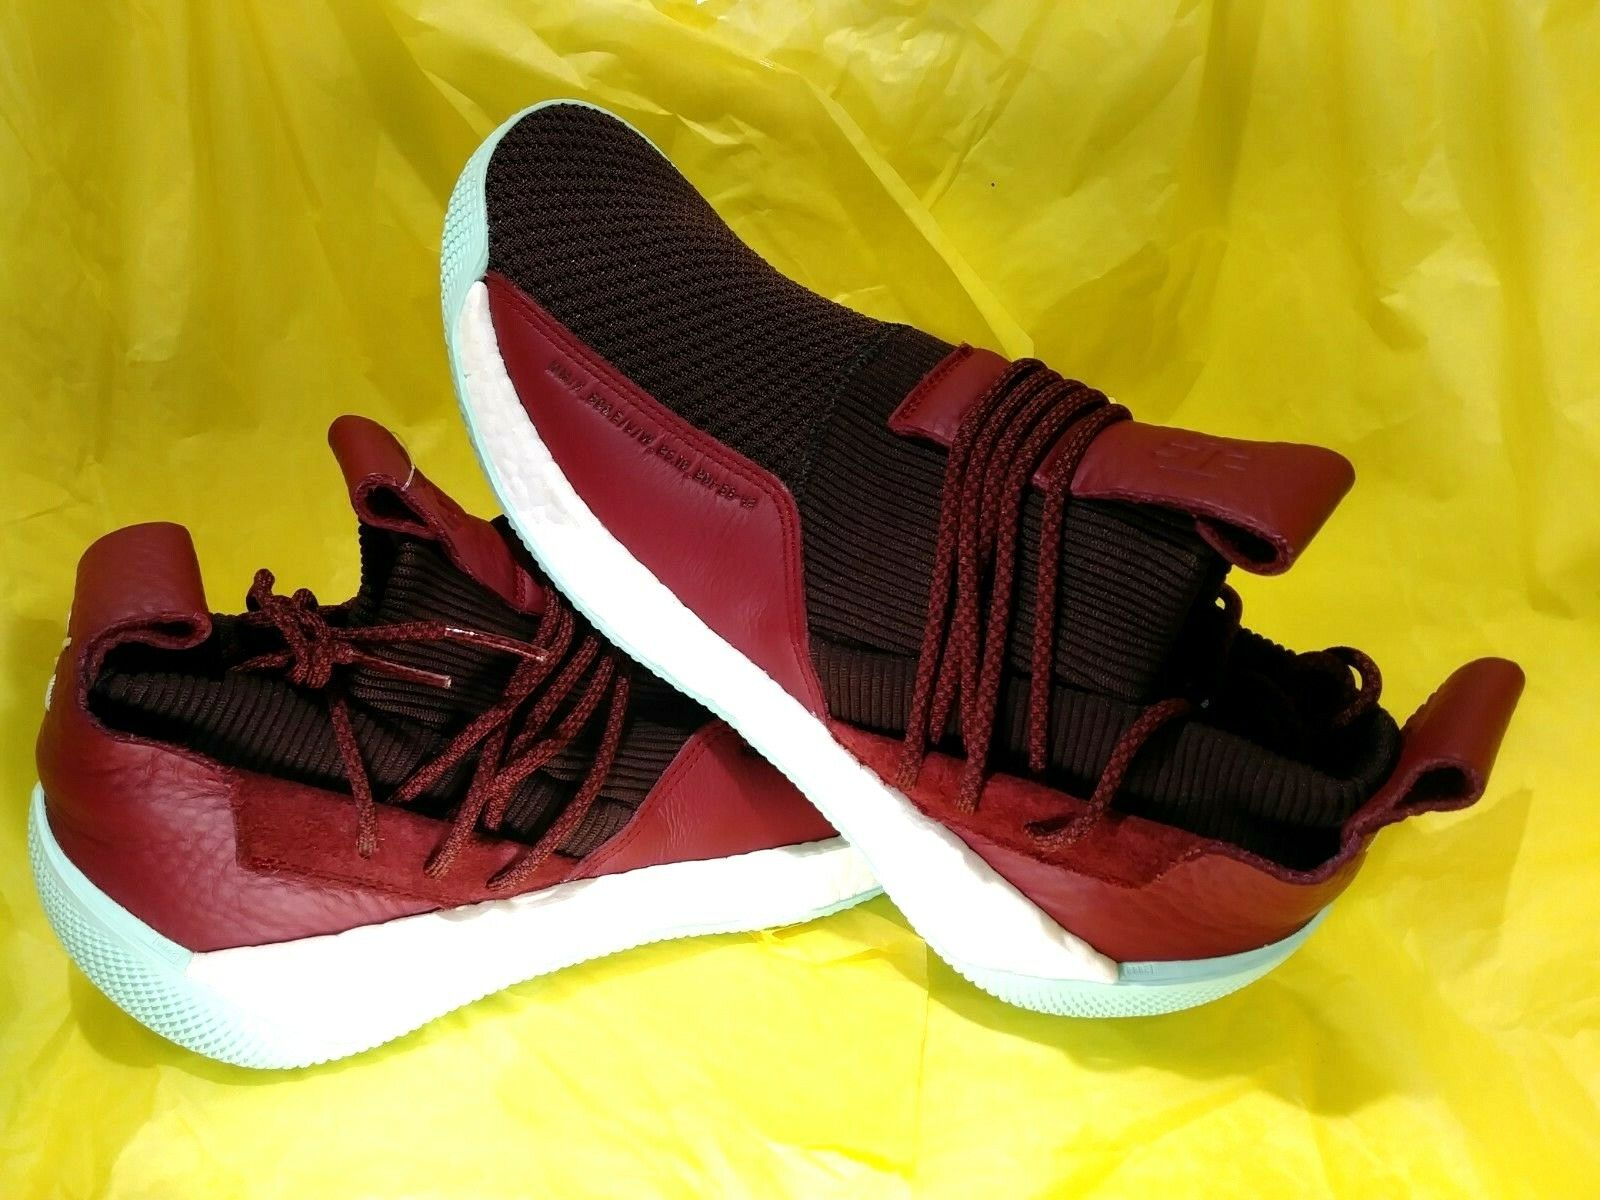 NEW MEN's Adidas James Harden LS 2 Lace BOOST Basketball skor Maroon Storlek 11.5